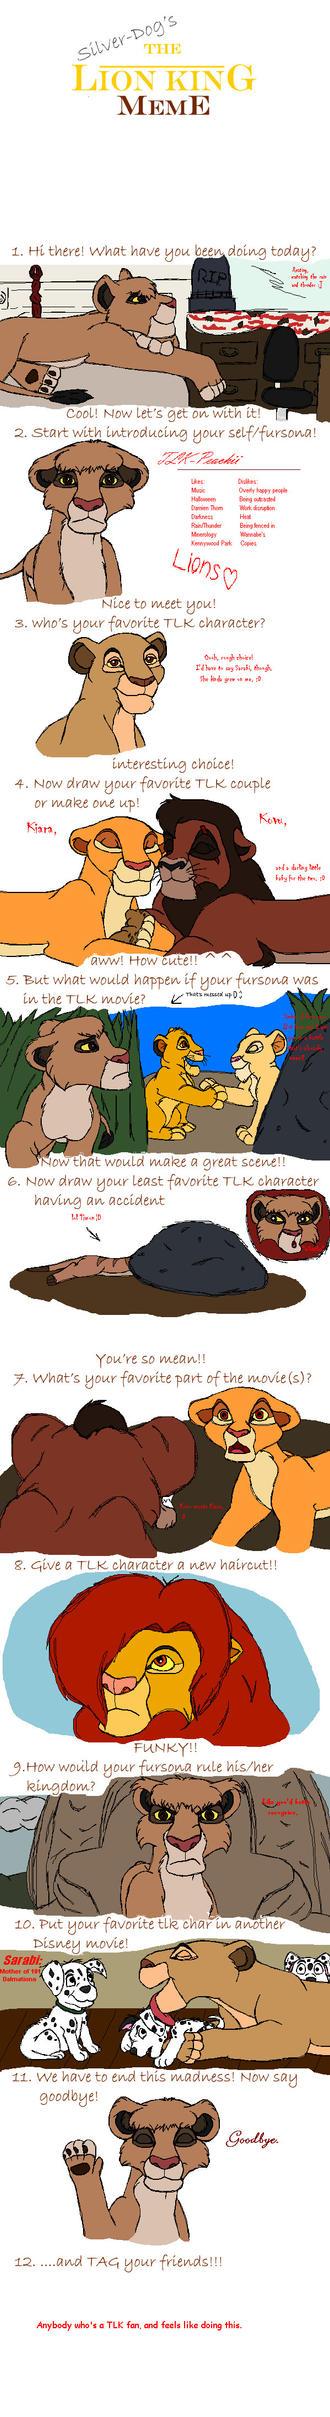 The Lion King Meme by TLK-Peachii